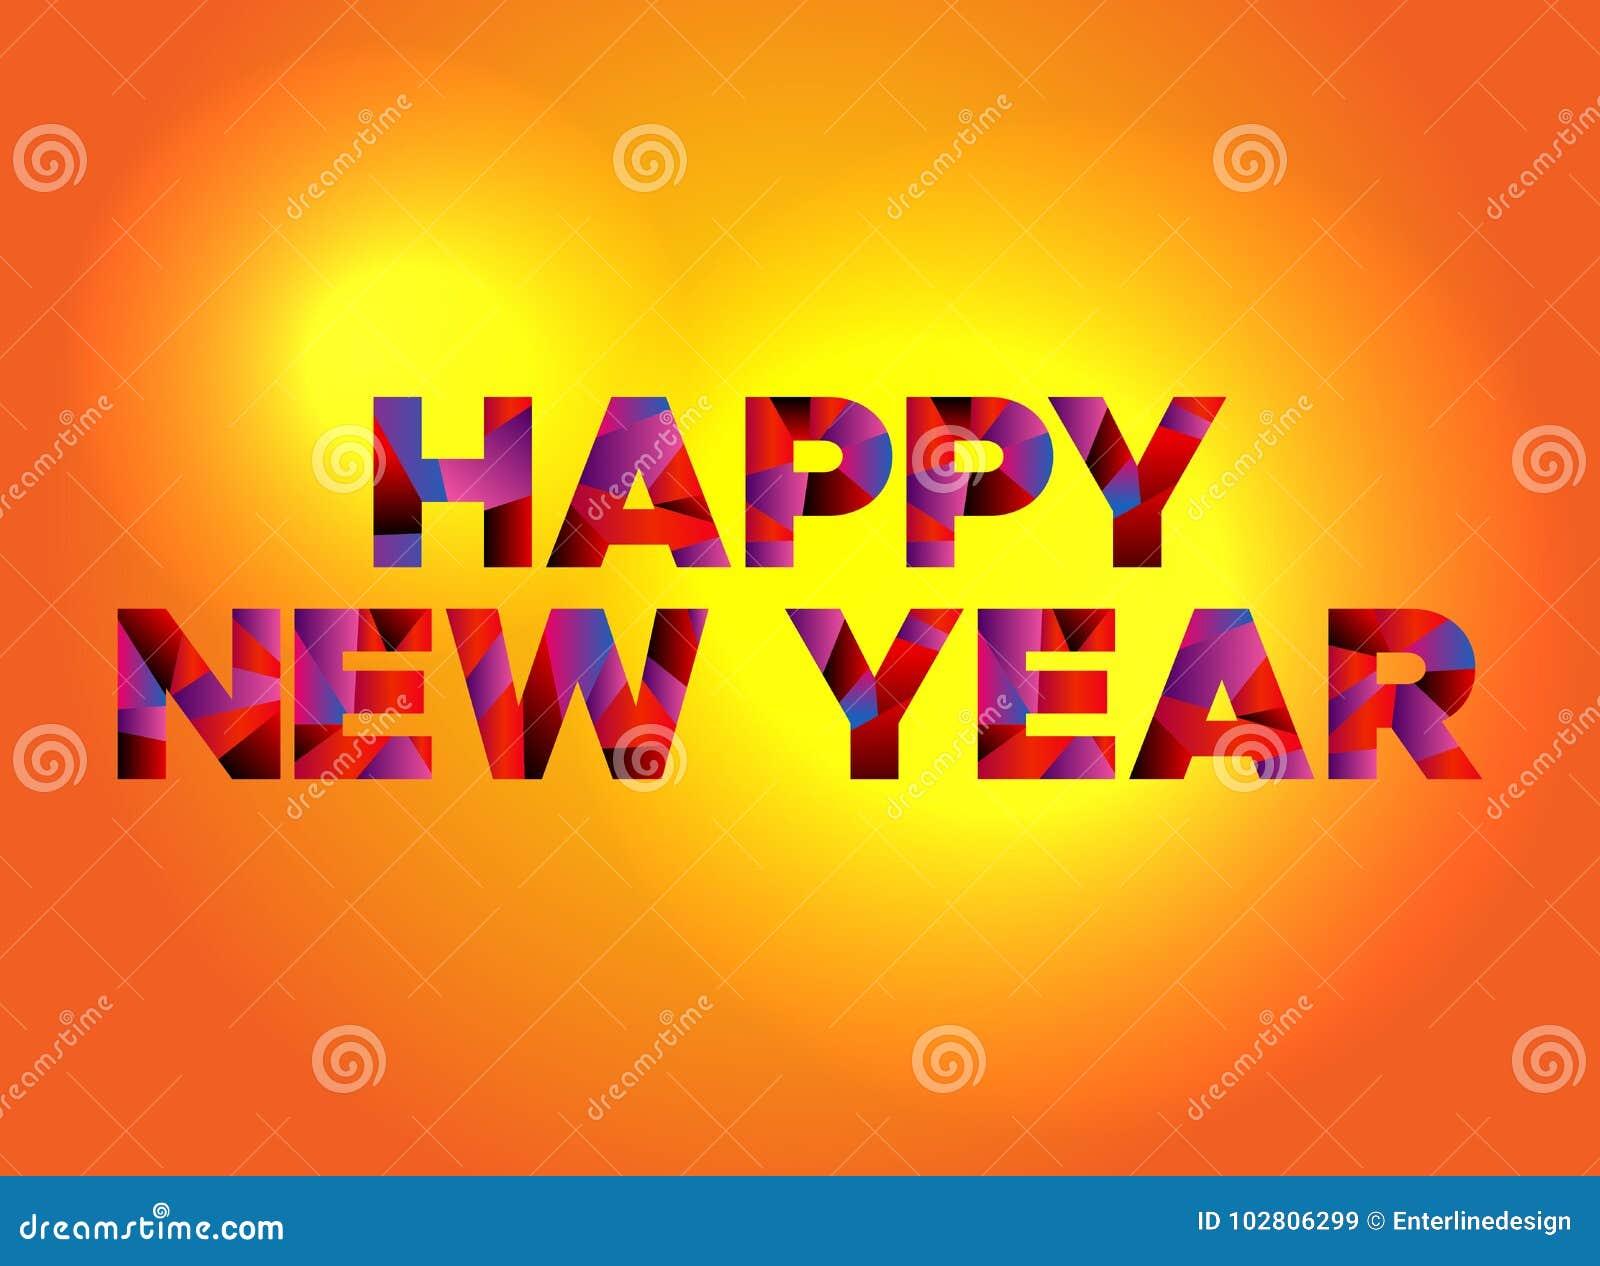 happy new year theme word art illustration